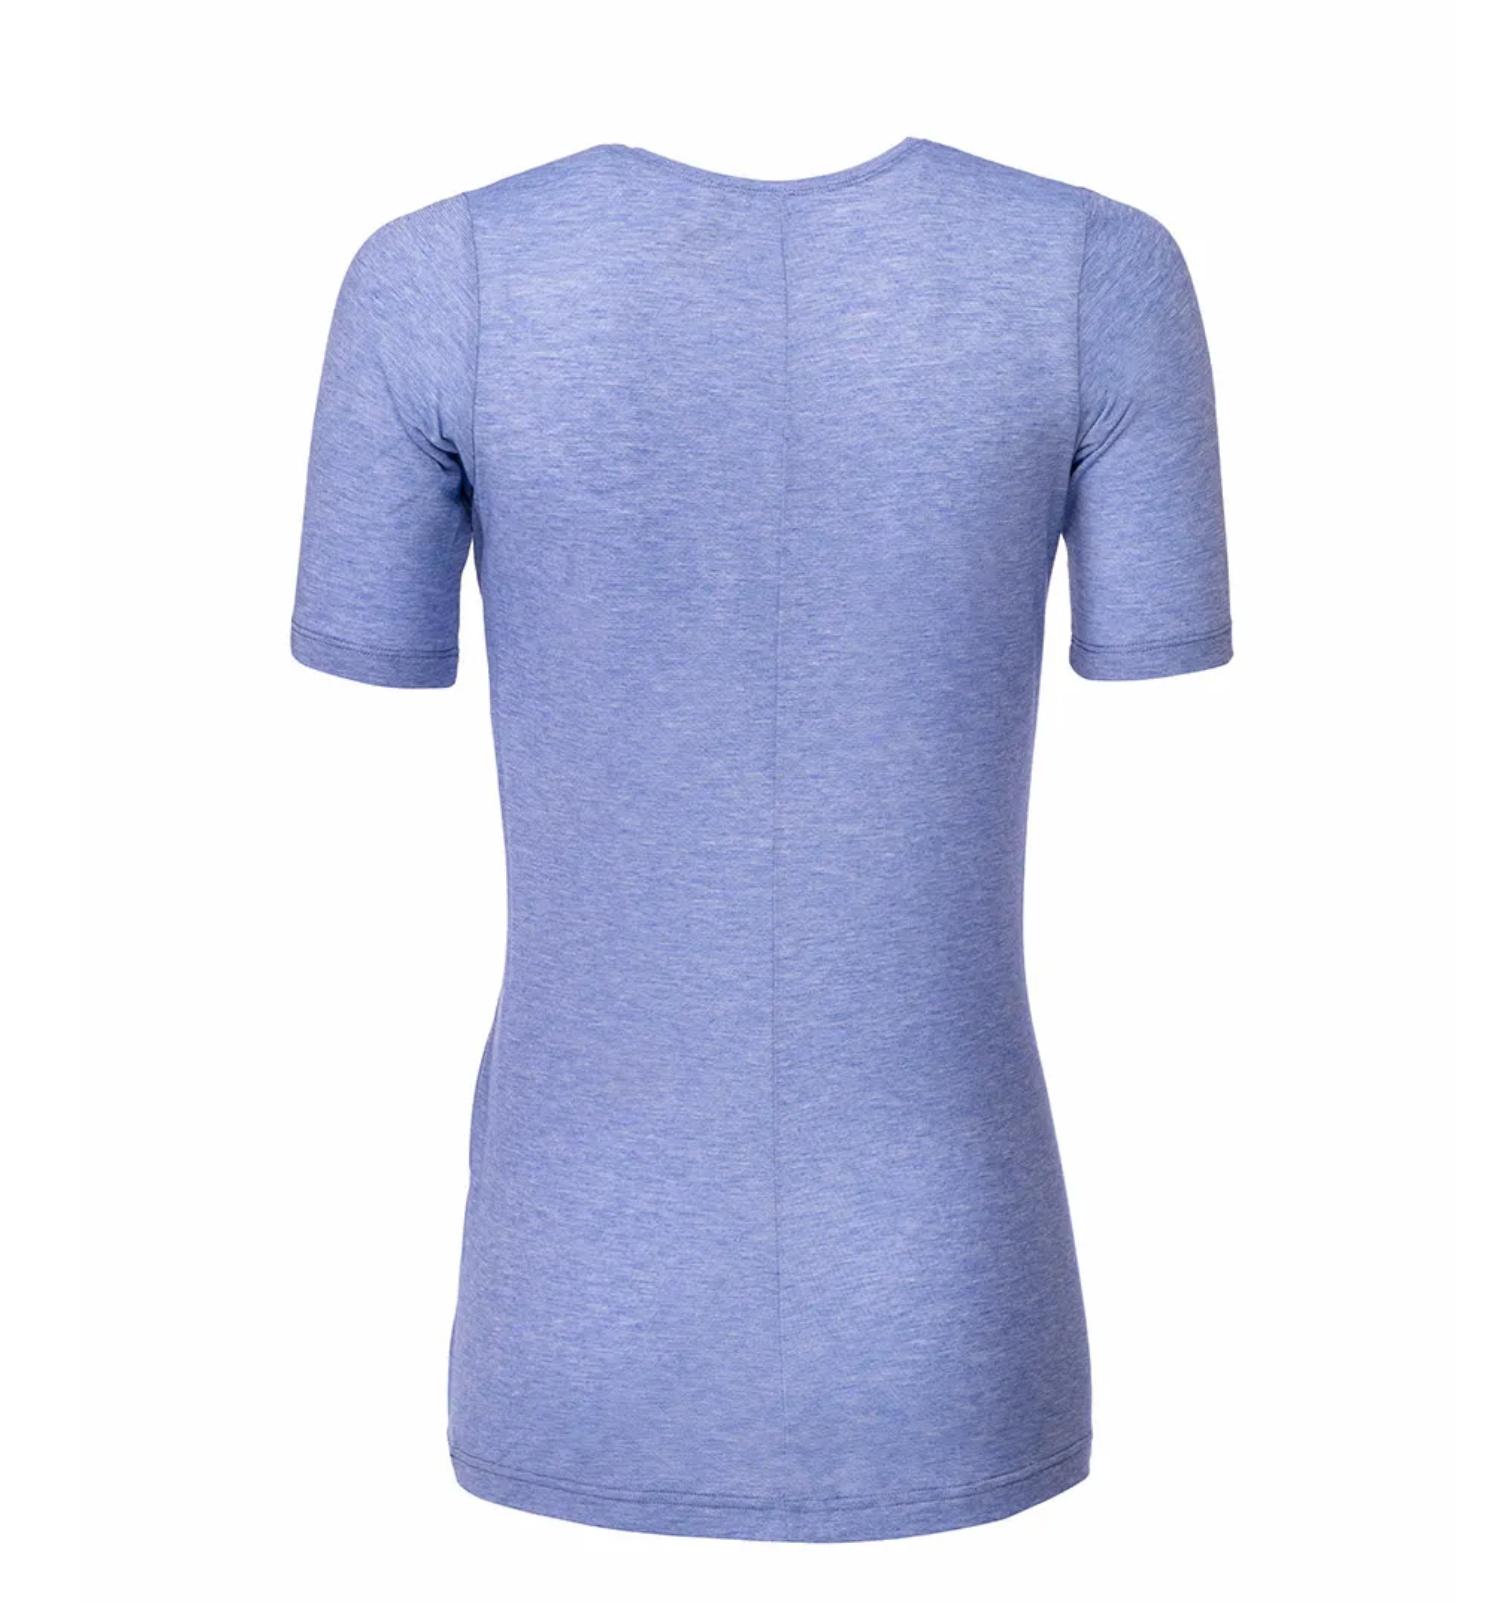 Women's Elevate T-Shirt Periwinkle-2